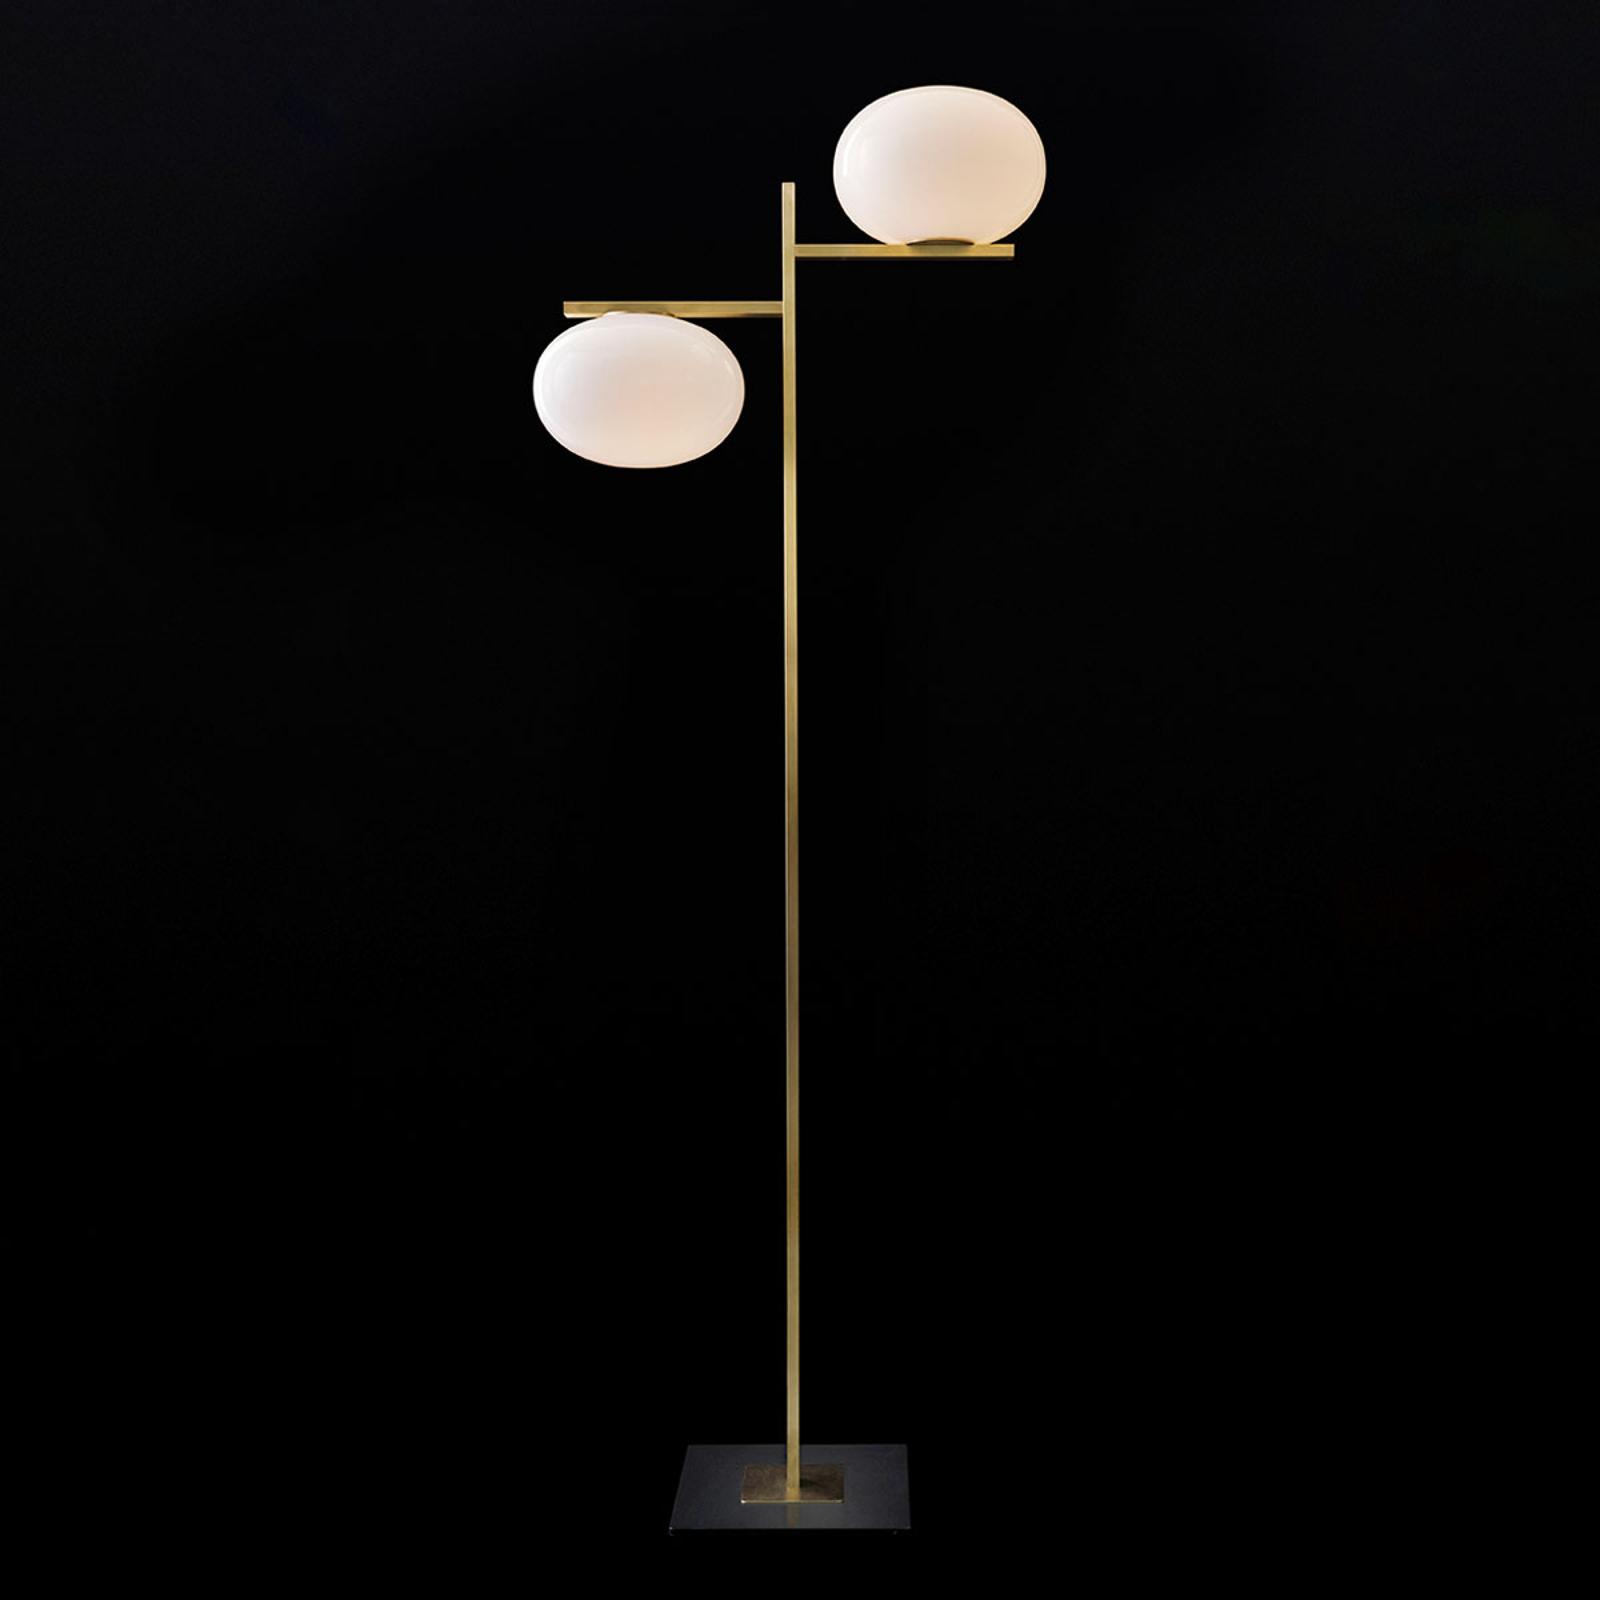 Oluce Alba - vloerlamp met dimmer, 2-lamps